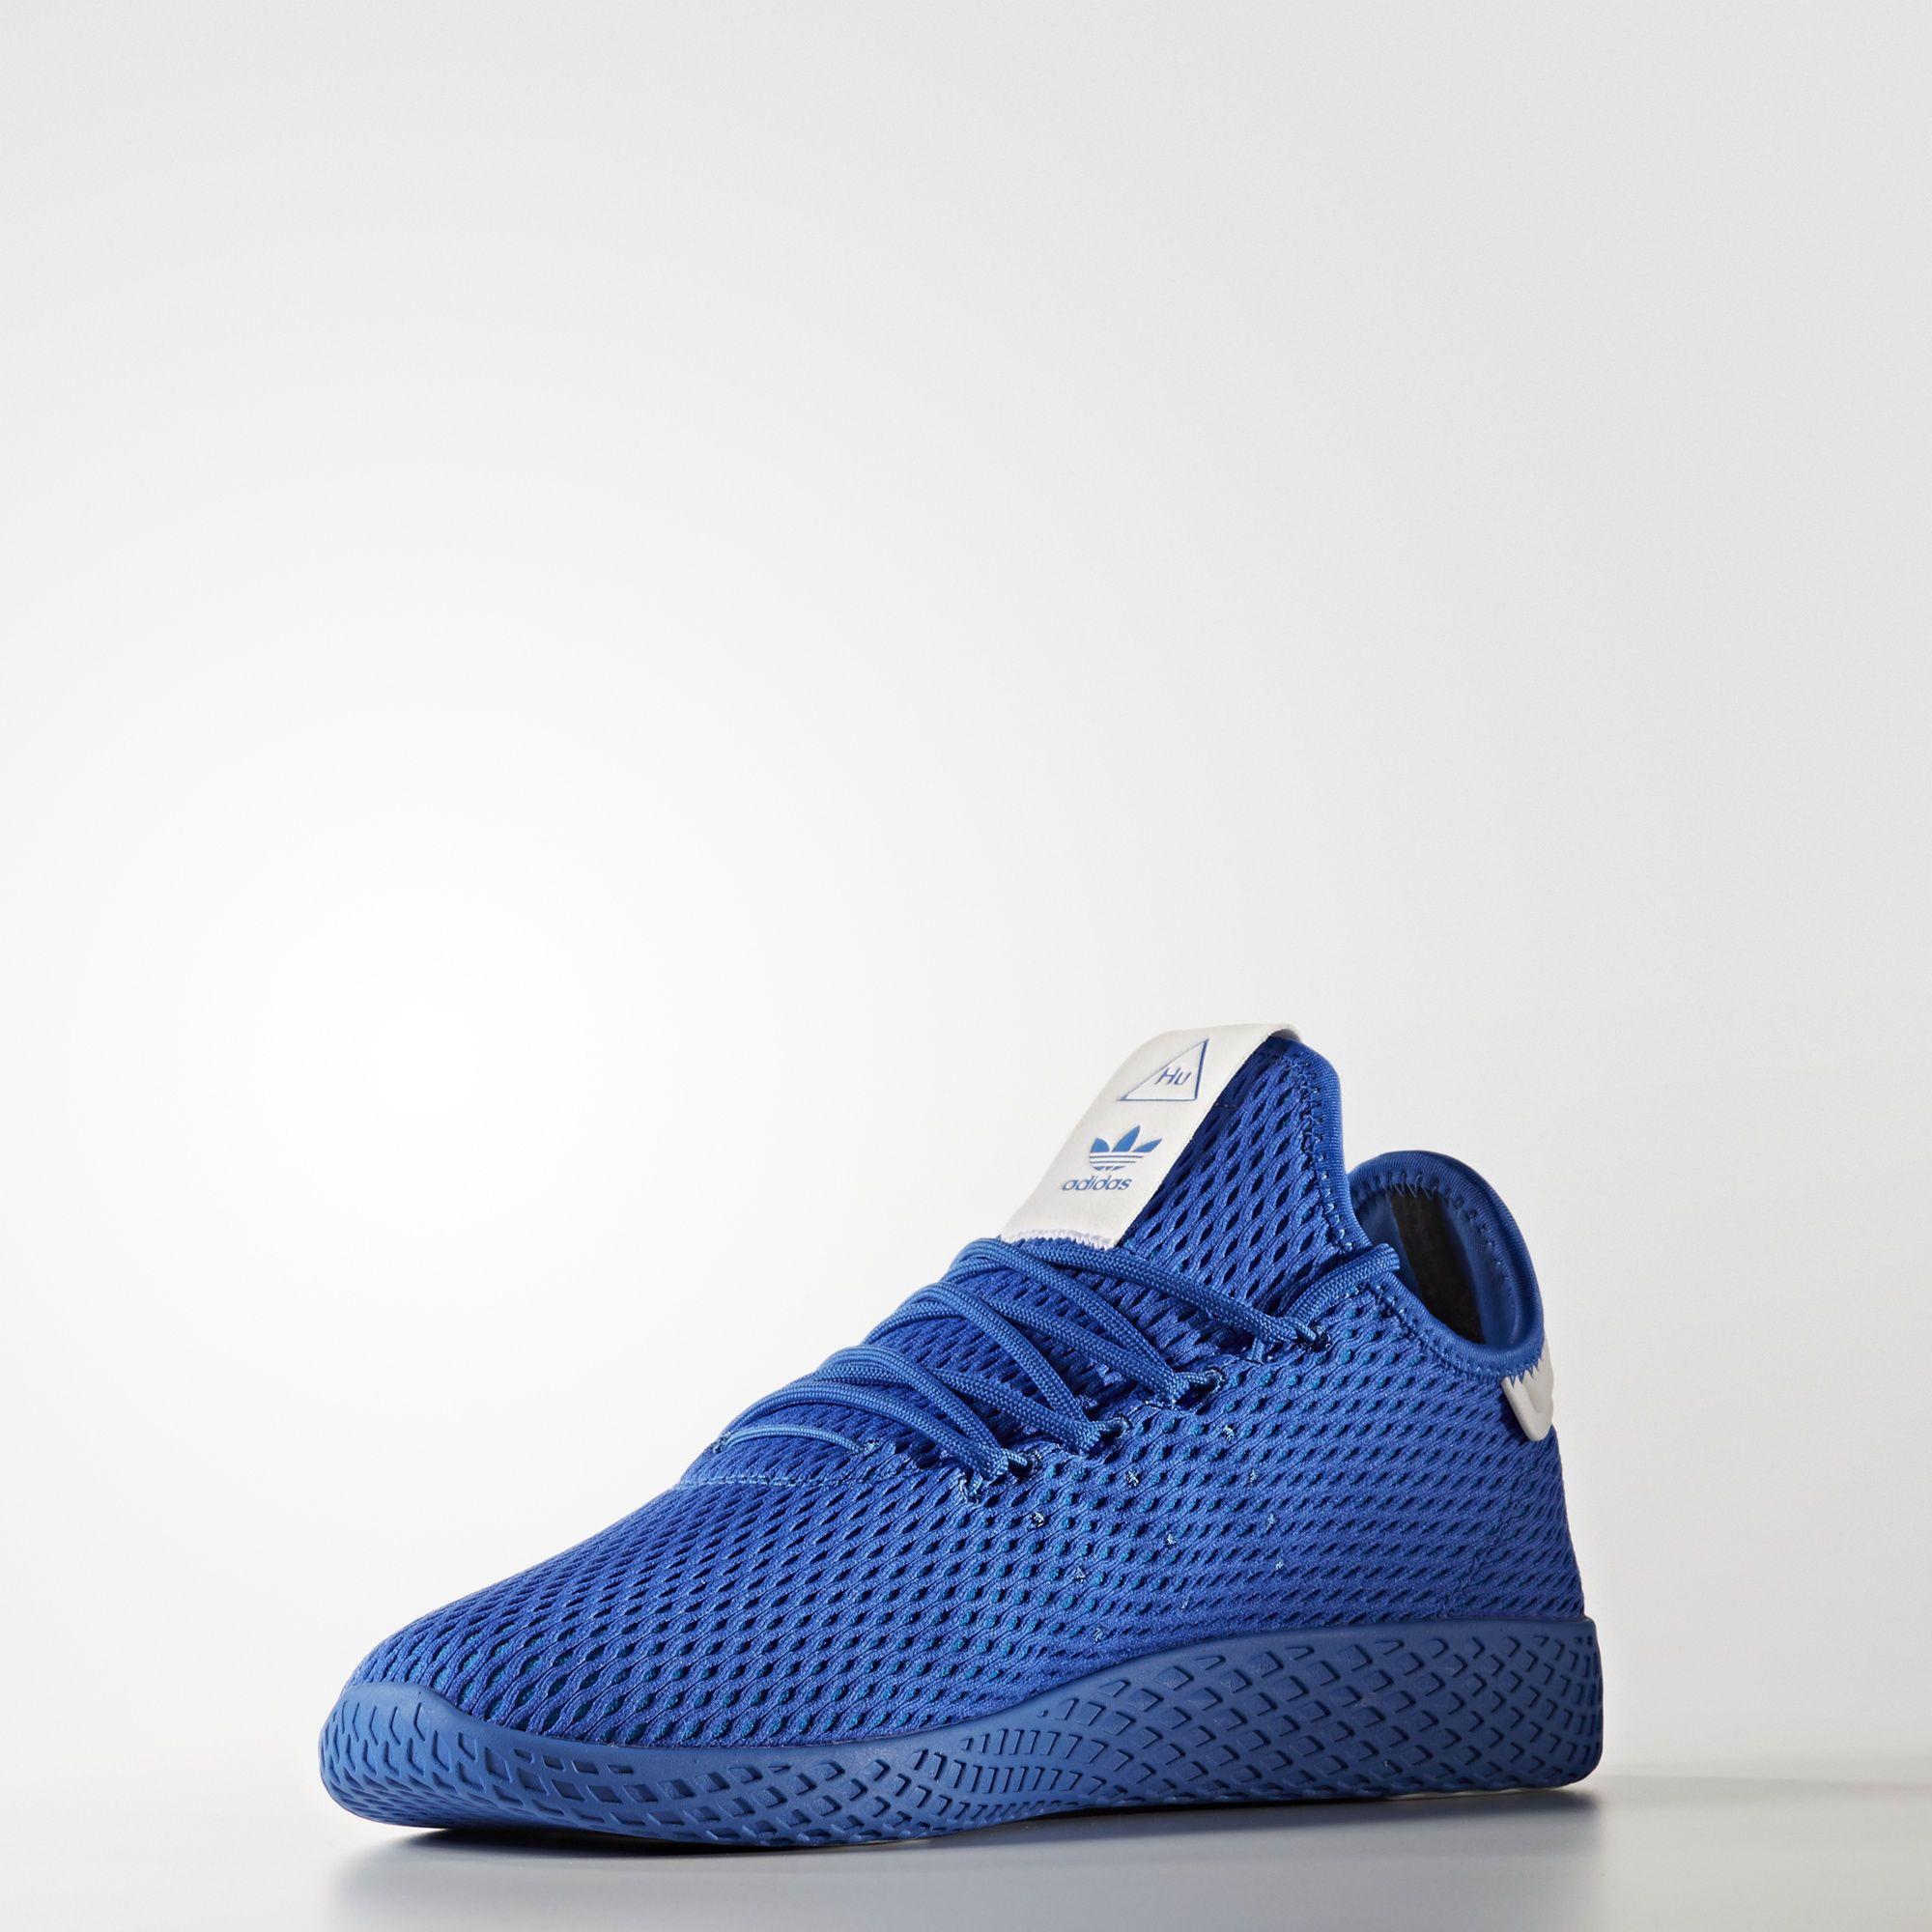 falda Devastar constantemente  adidas Pharrell Williams Tennis Hu | Adidas shoes mens, Blue sneakers, Blue  adidas